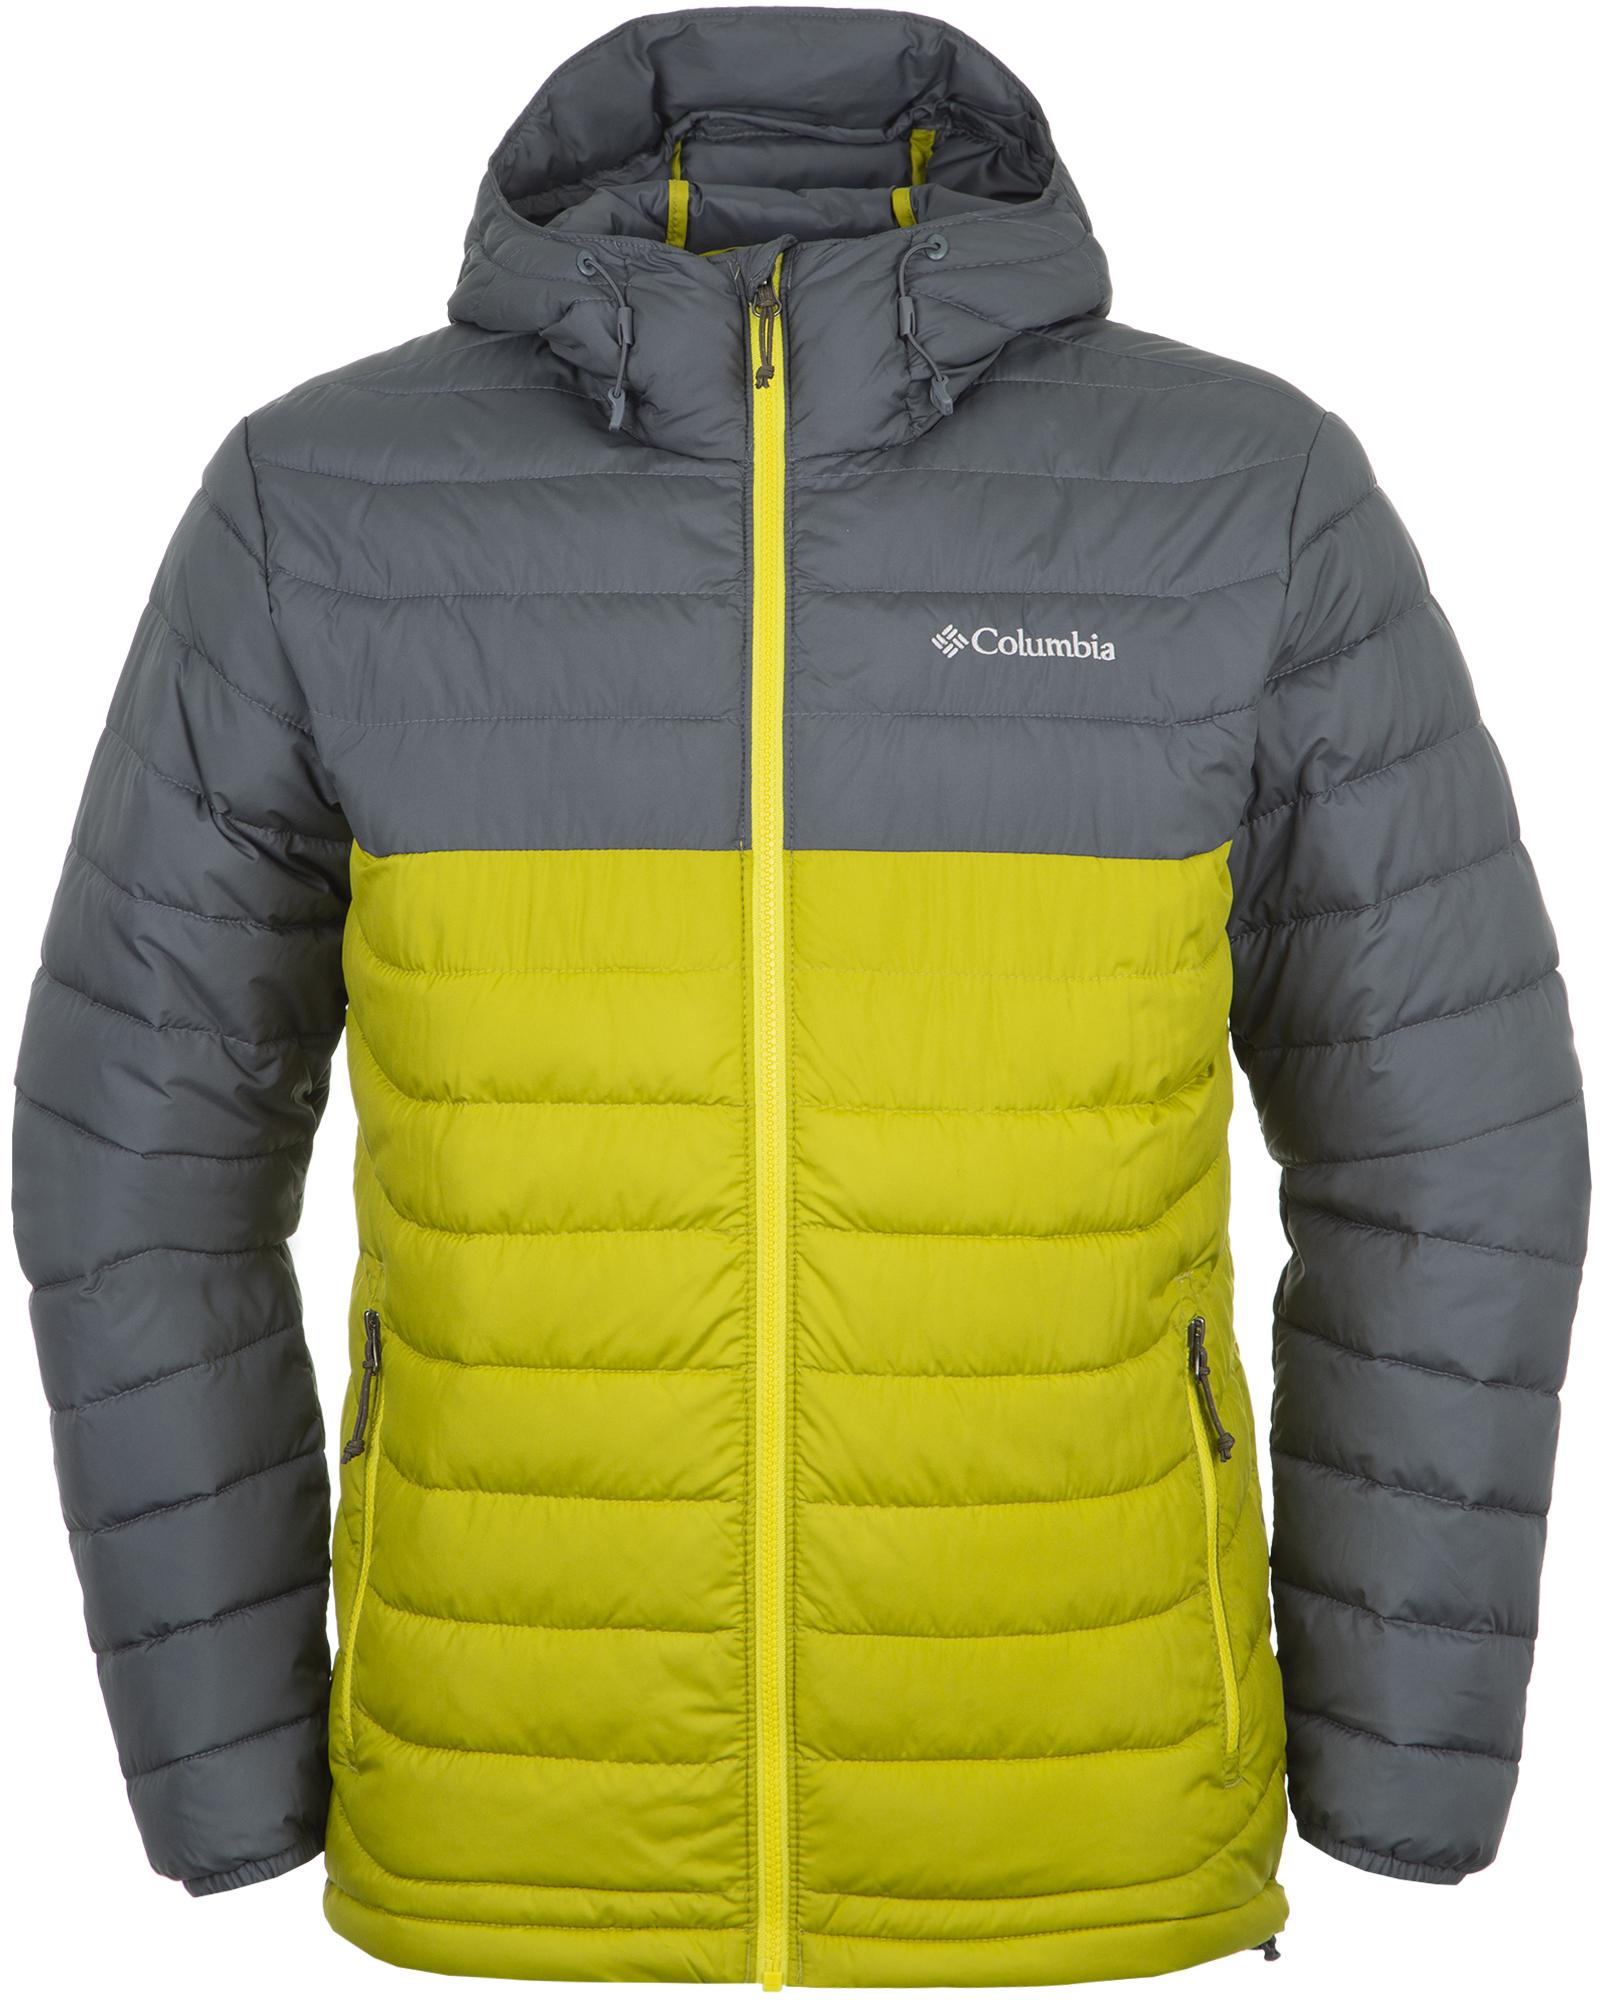 Columbia Куртка утепленная мужская Columbia Powder Lite, размер 56-58